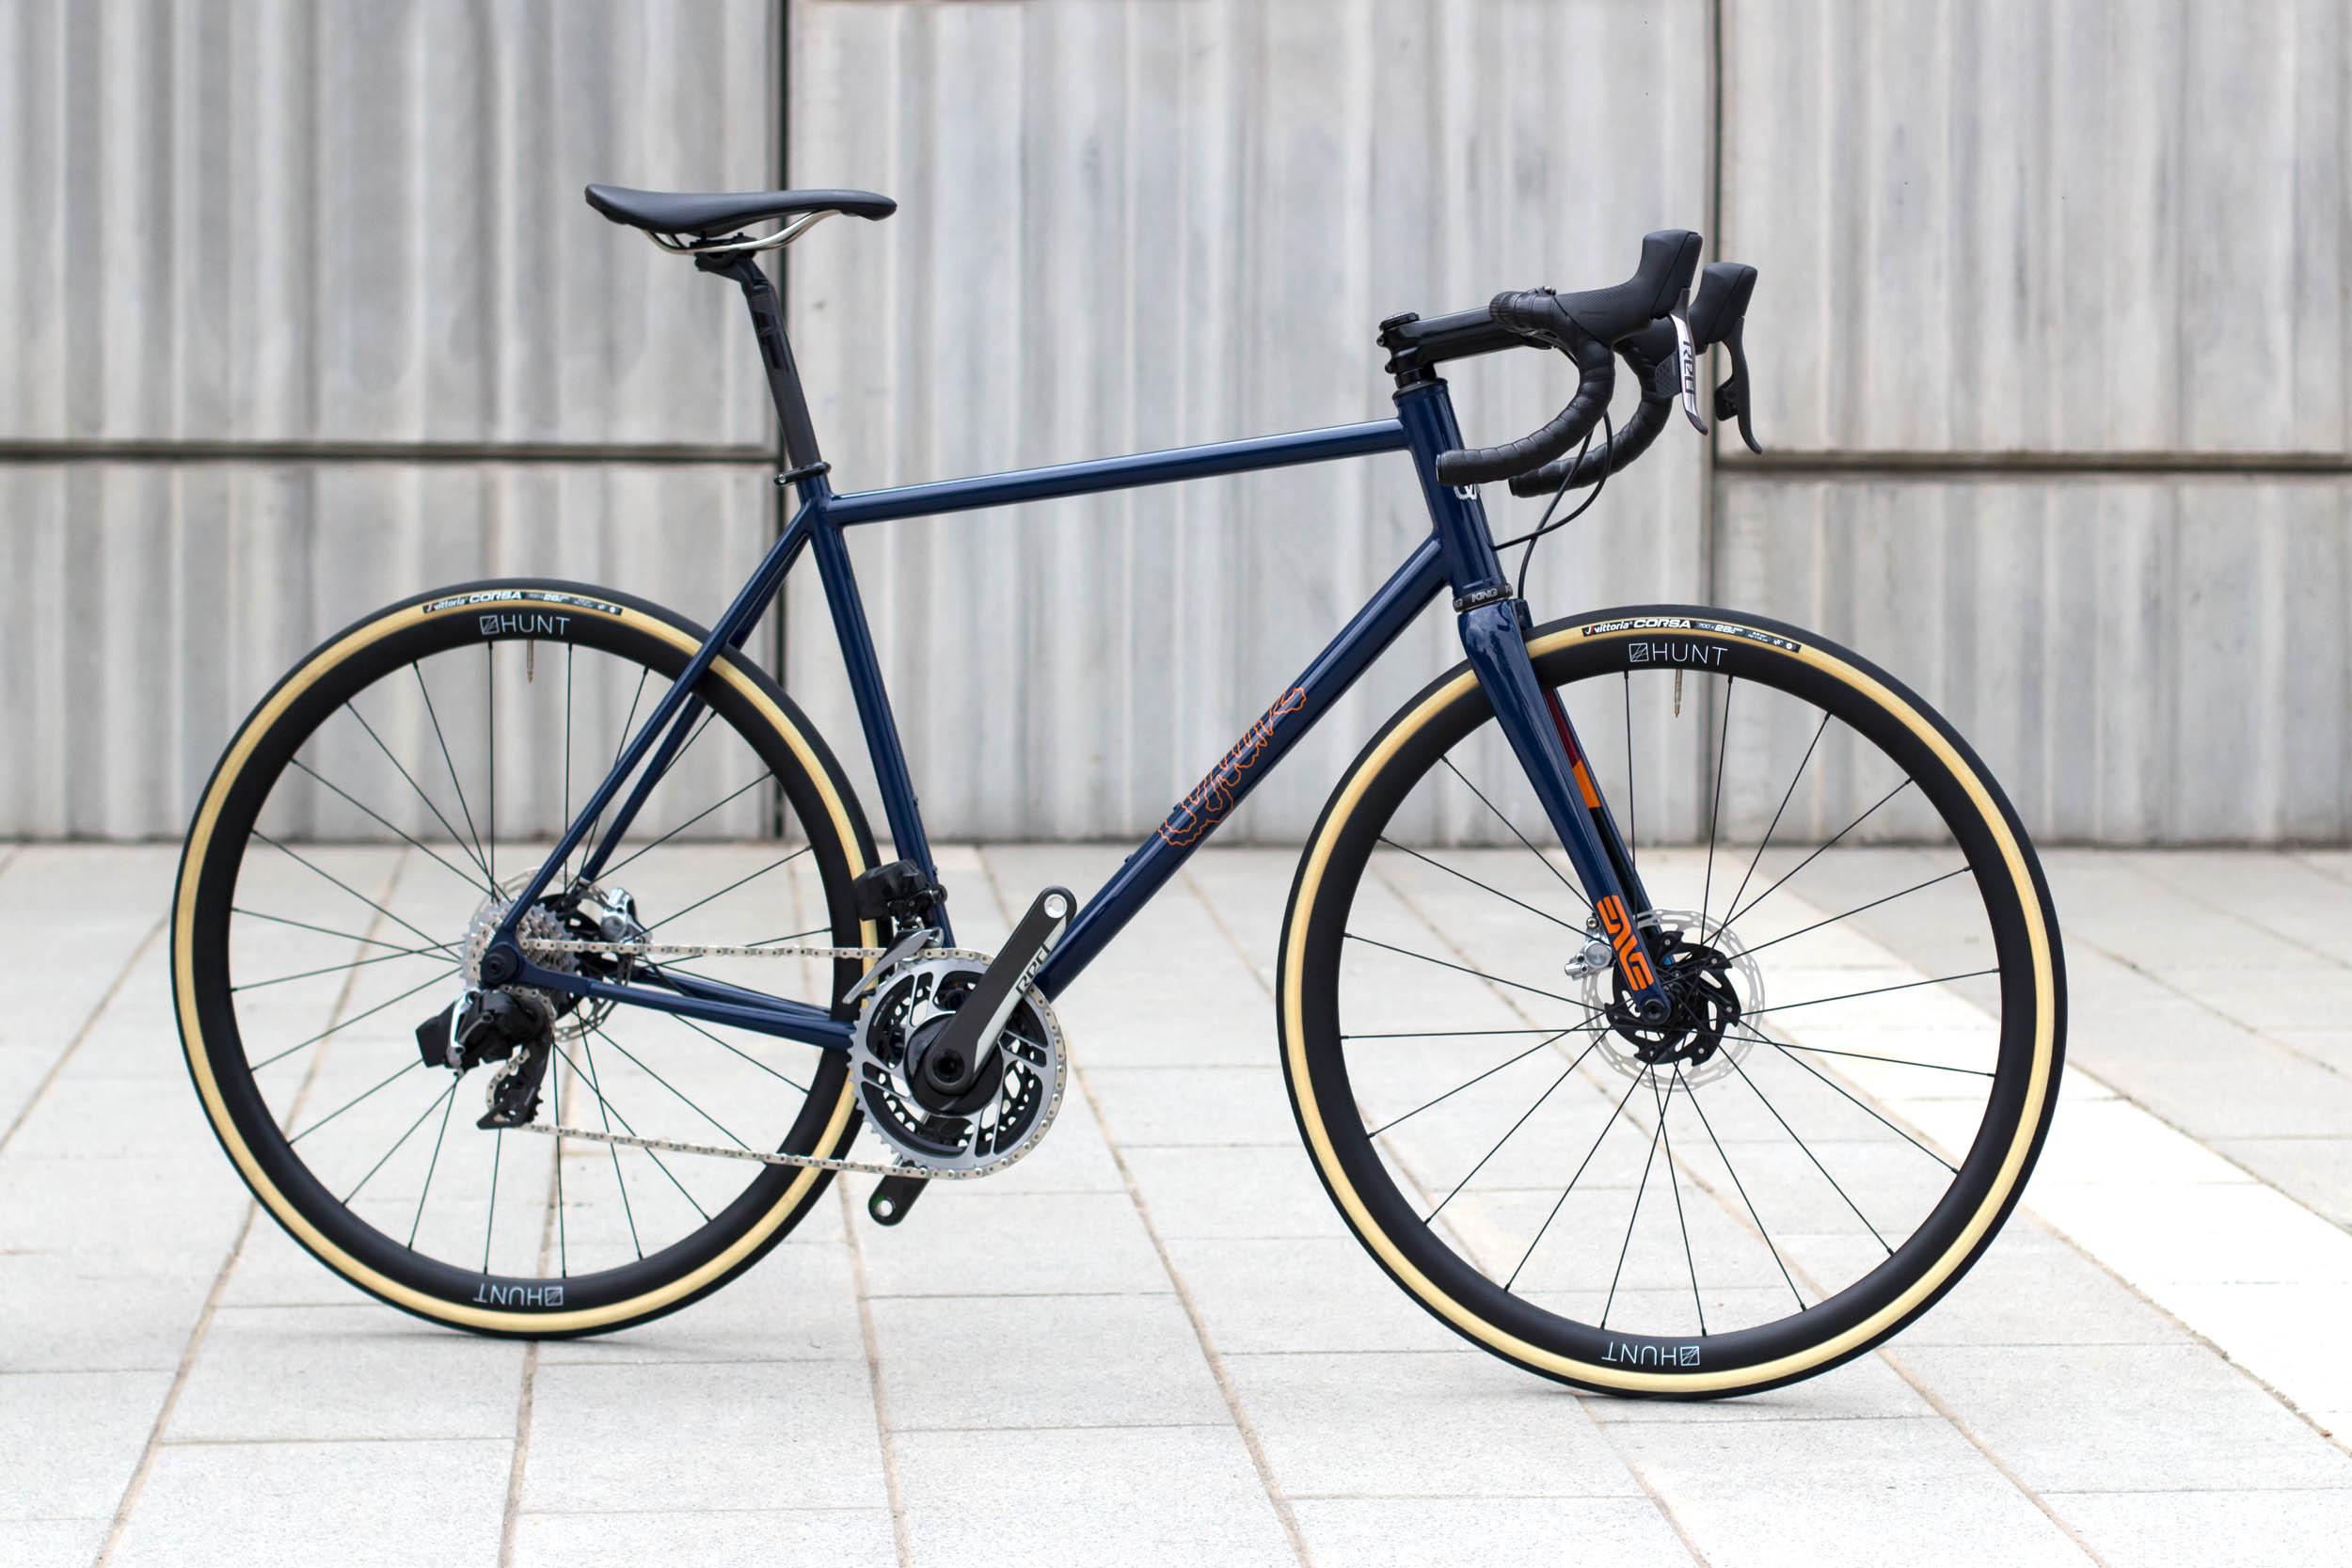 quirk_cycles_charlie_sheldon_durmitor_13.jpg